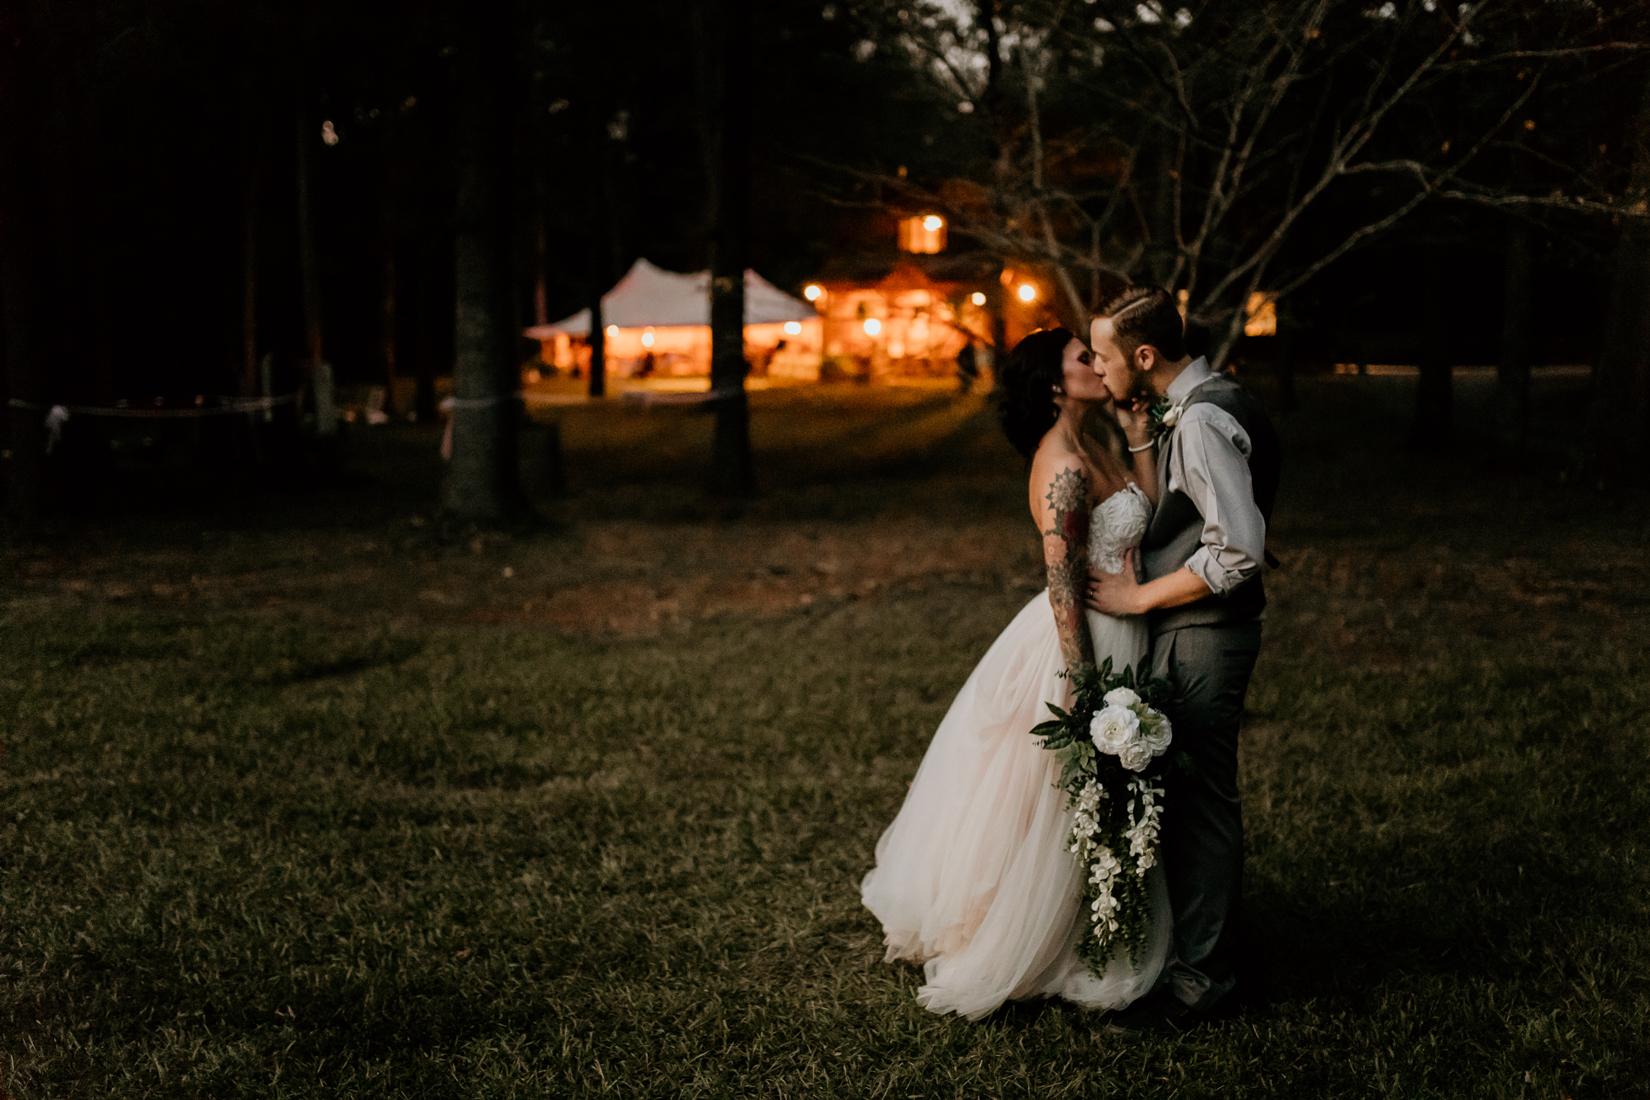 olivia_zay_wedding_09_2018-8868.jpg